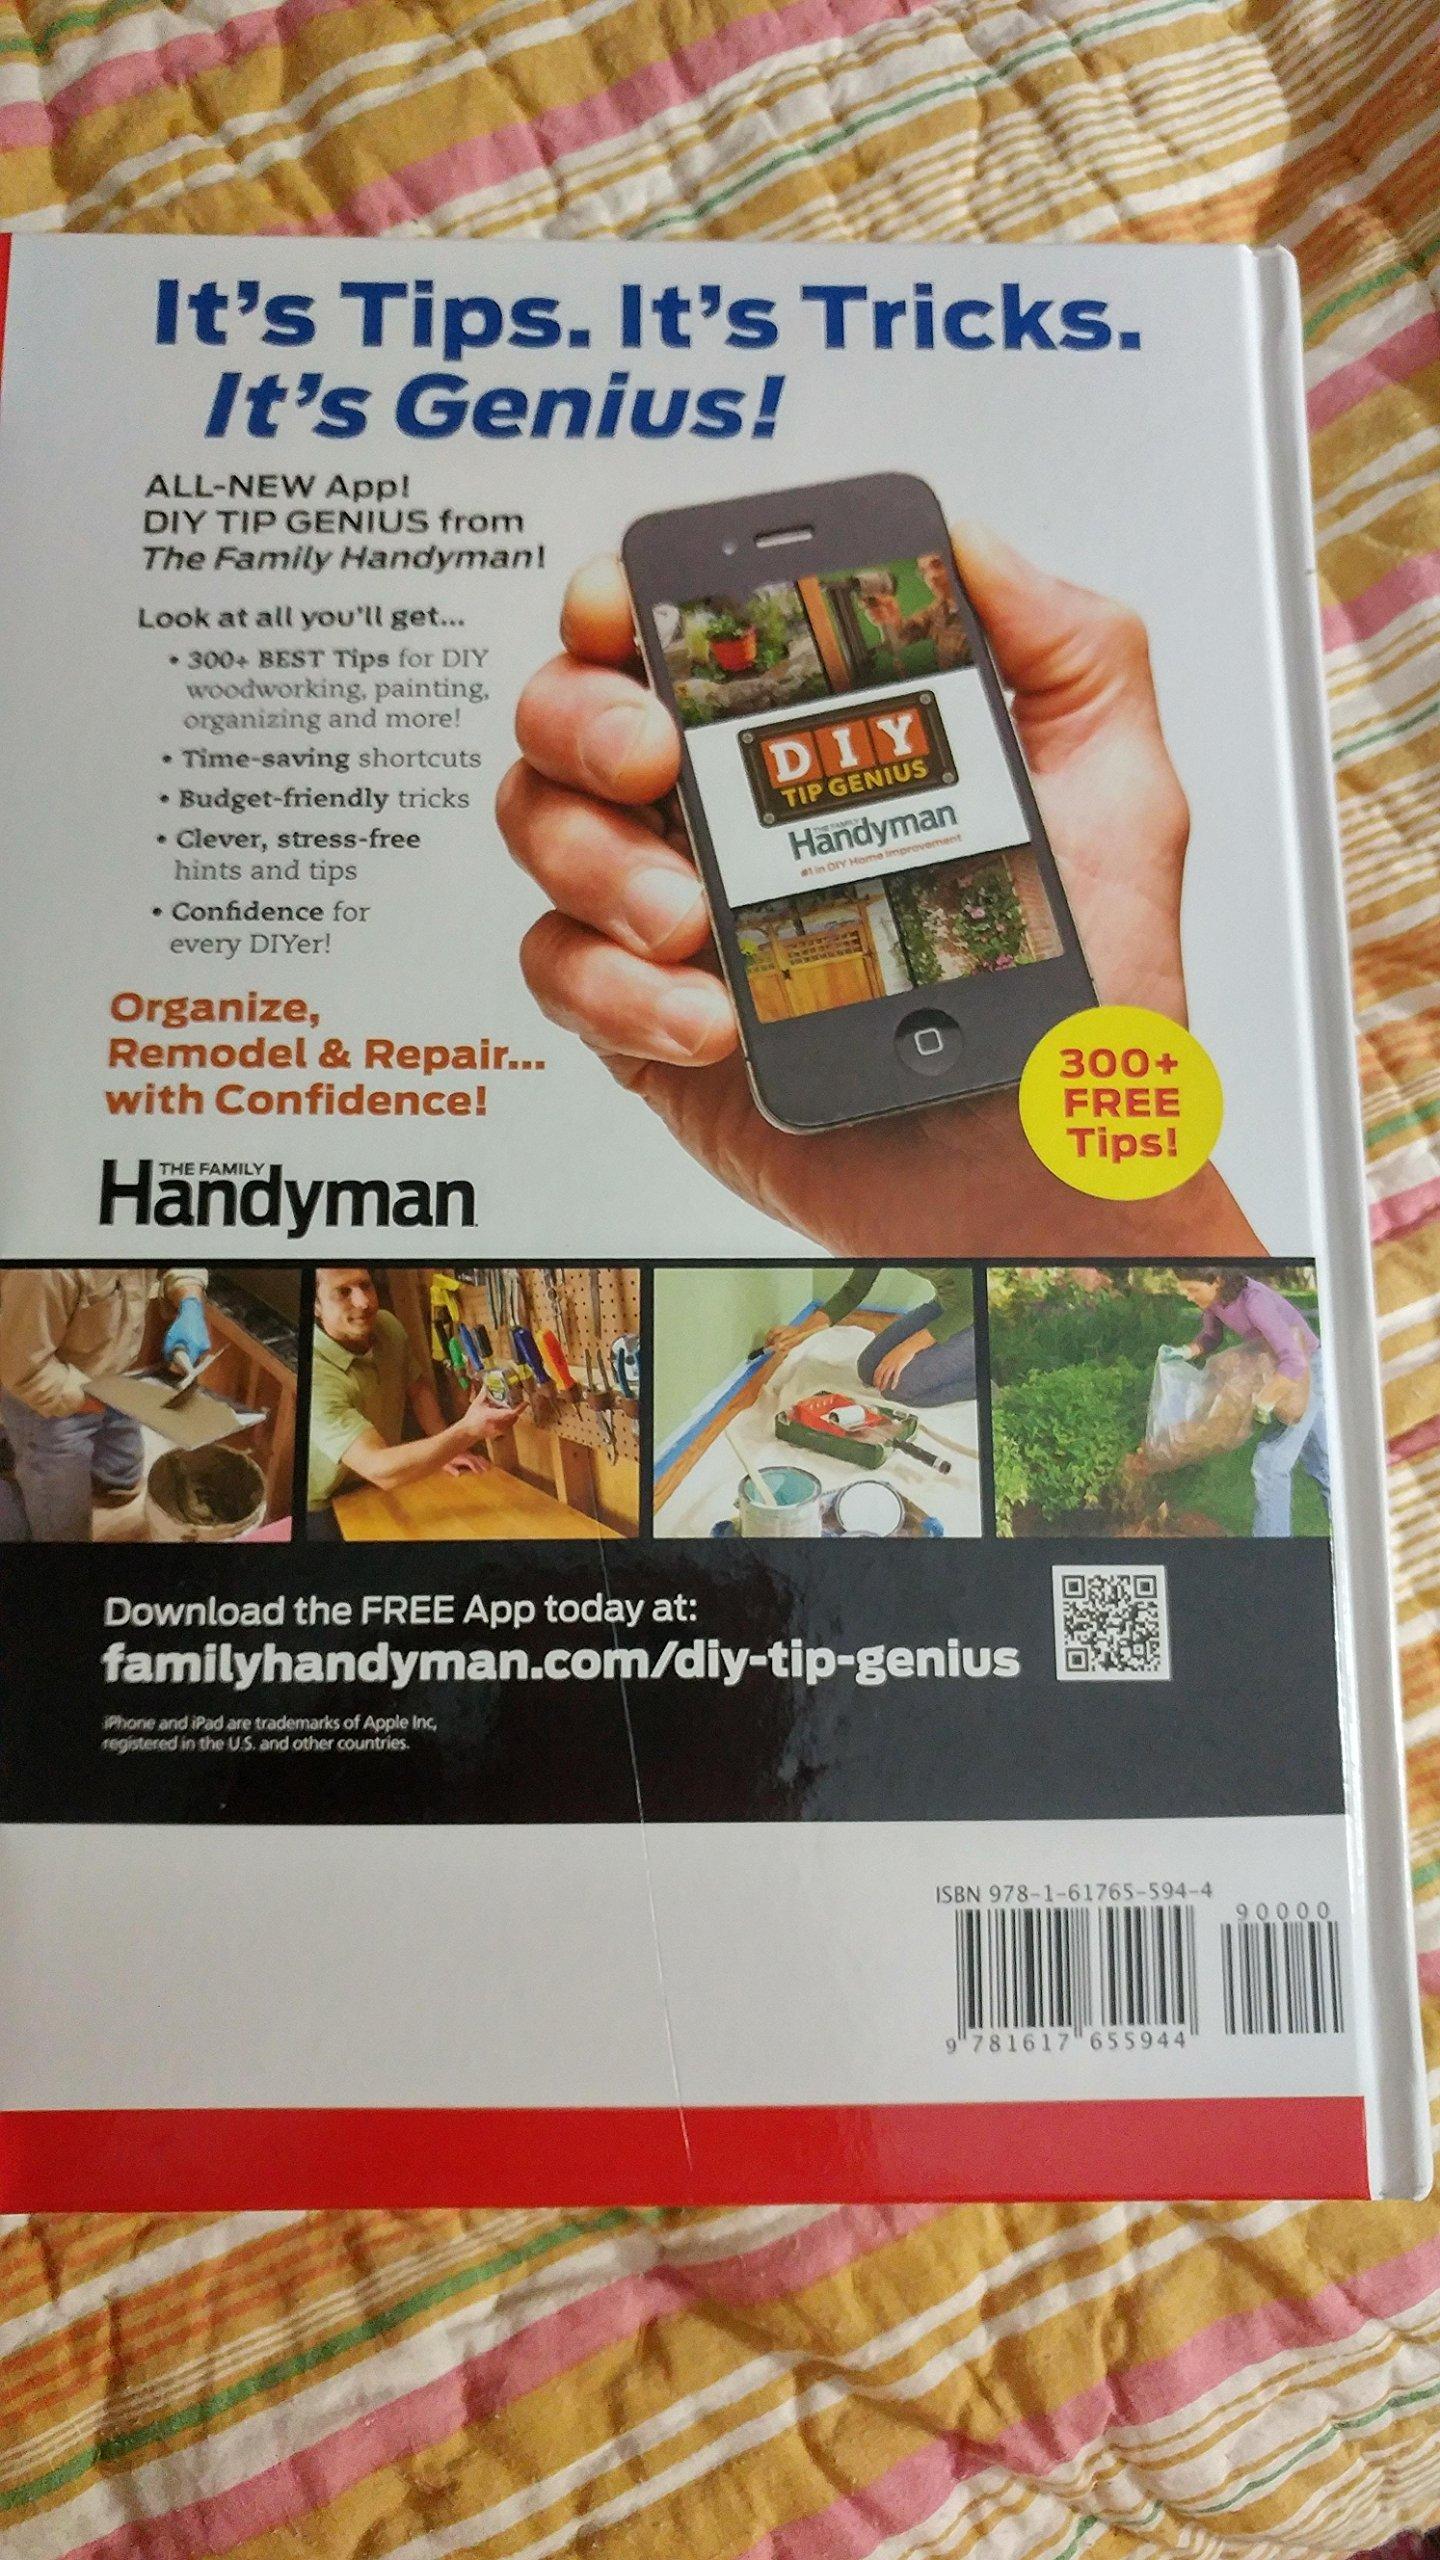 Free handyman price list - The Family Handyman Build Your Skills Over 325 Pro Tips 9781617655944 Amazon Com Books